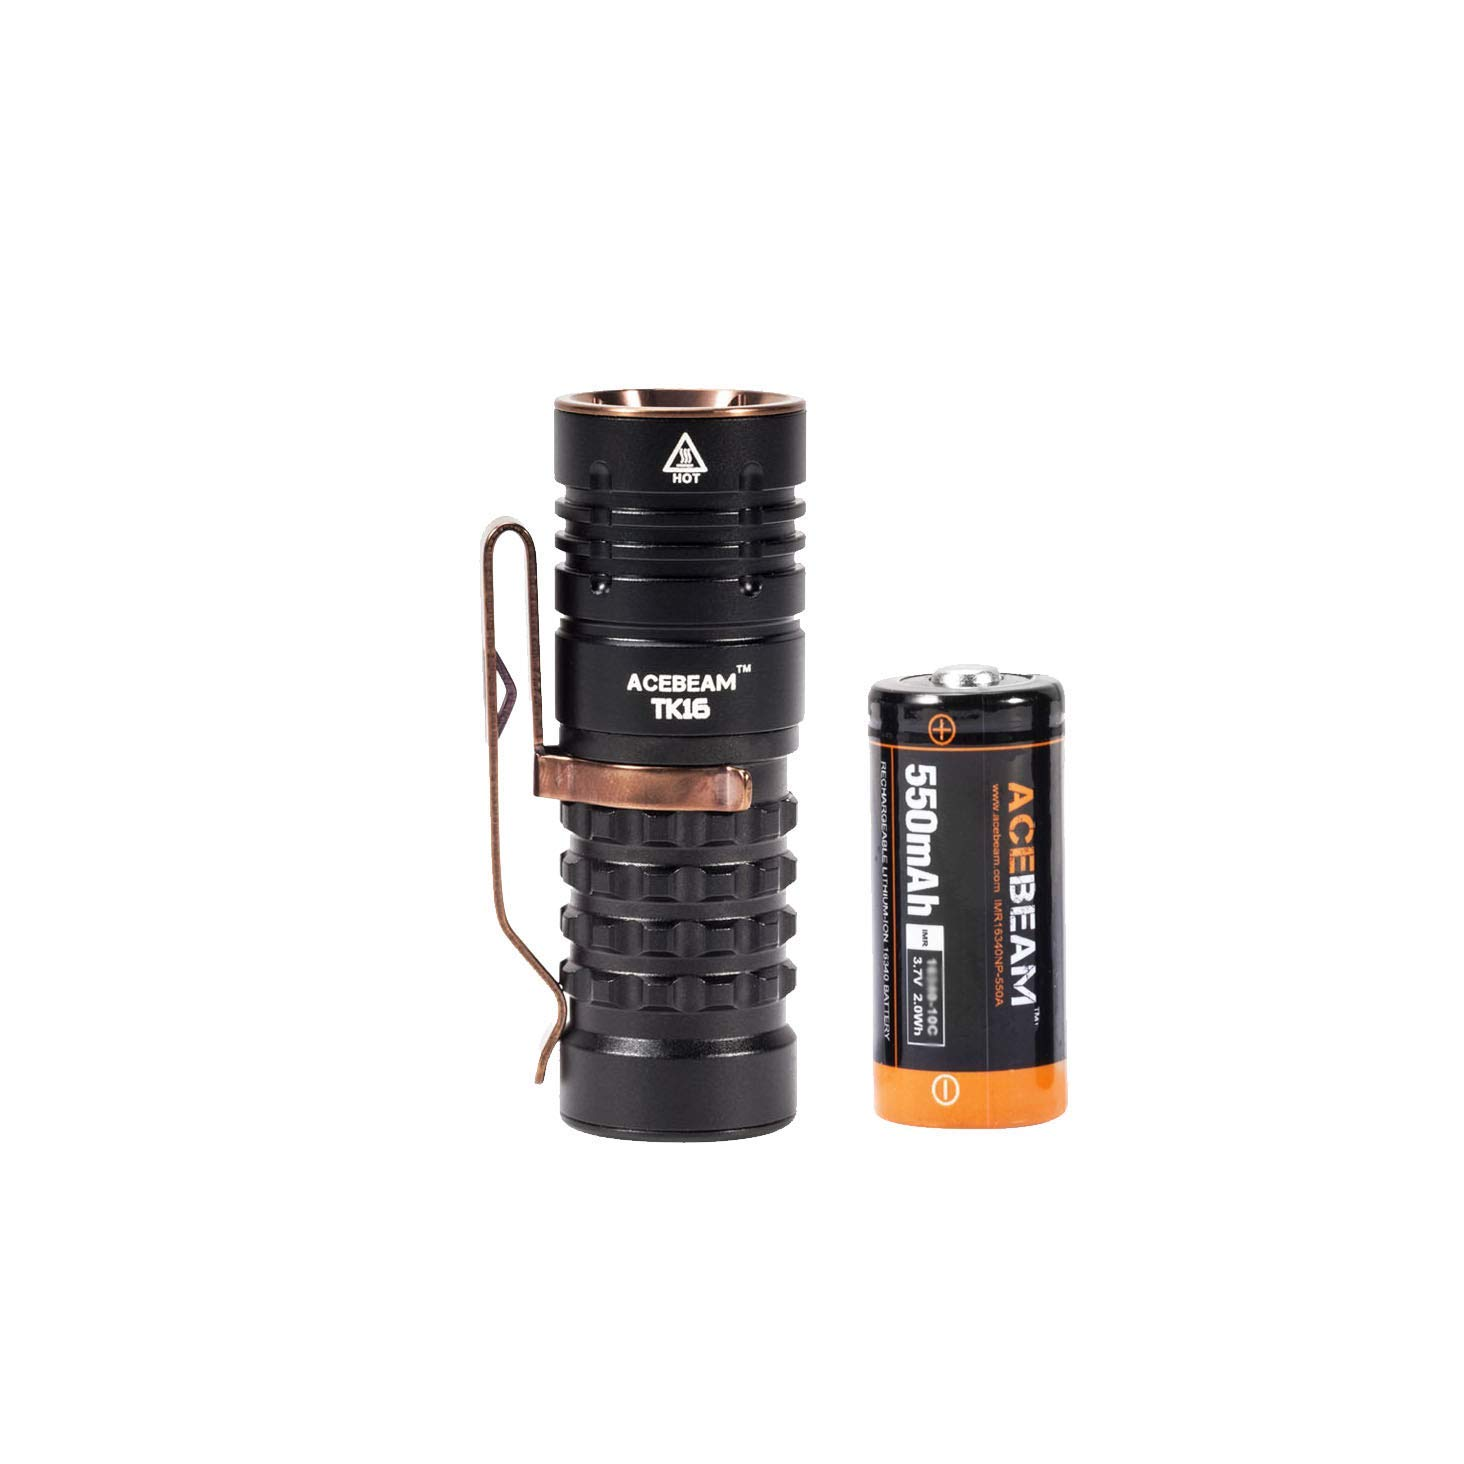 ACEBEAM TK16 Mini Flashlight w/Rechargeable Battery, Super Bright 1800 Lumens Cree LED EDC Flashlights